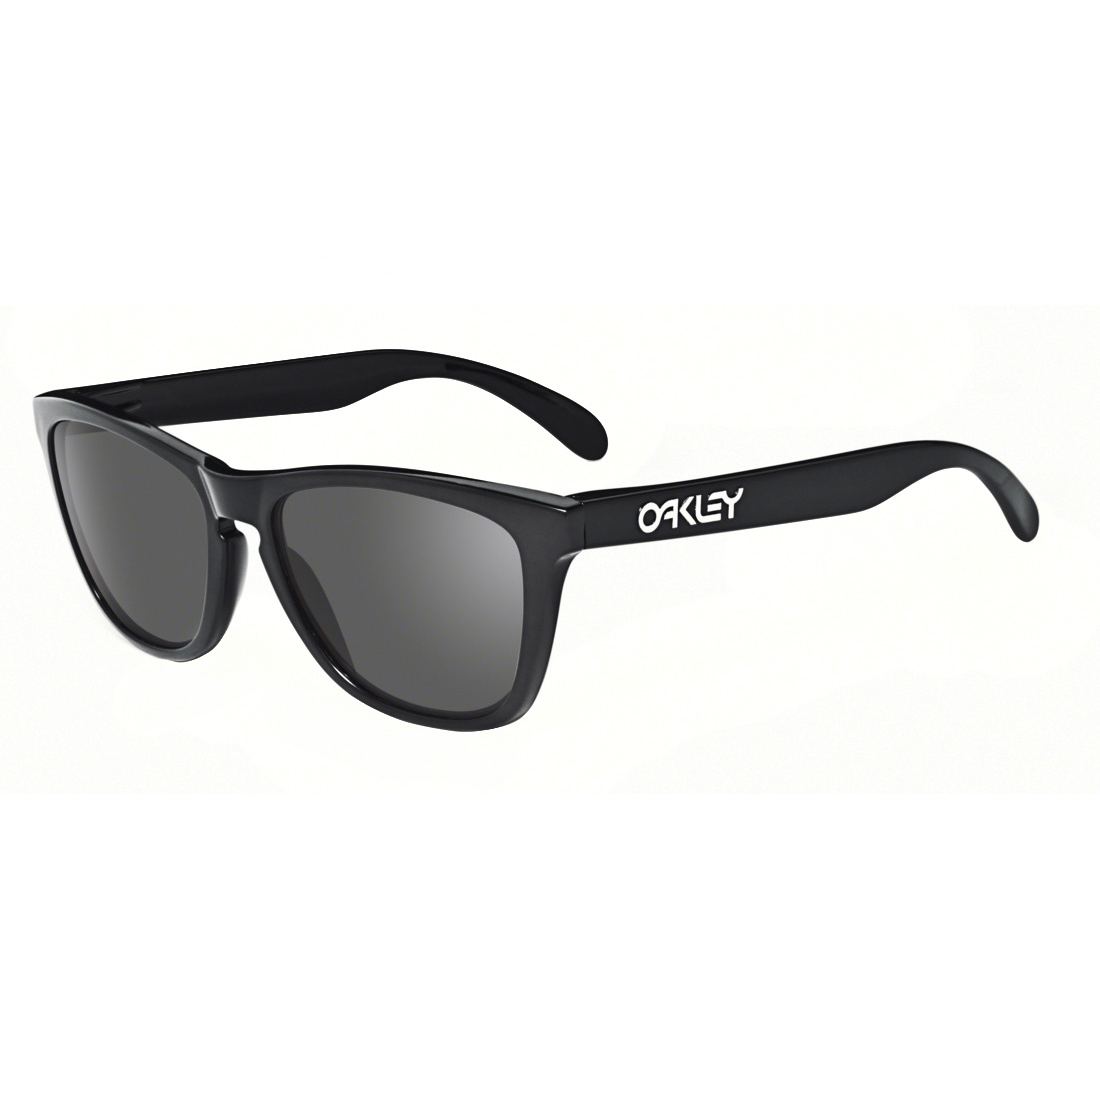 Oakley Frogskins Polished Black With Grey